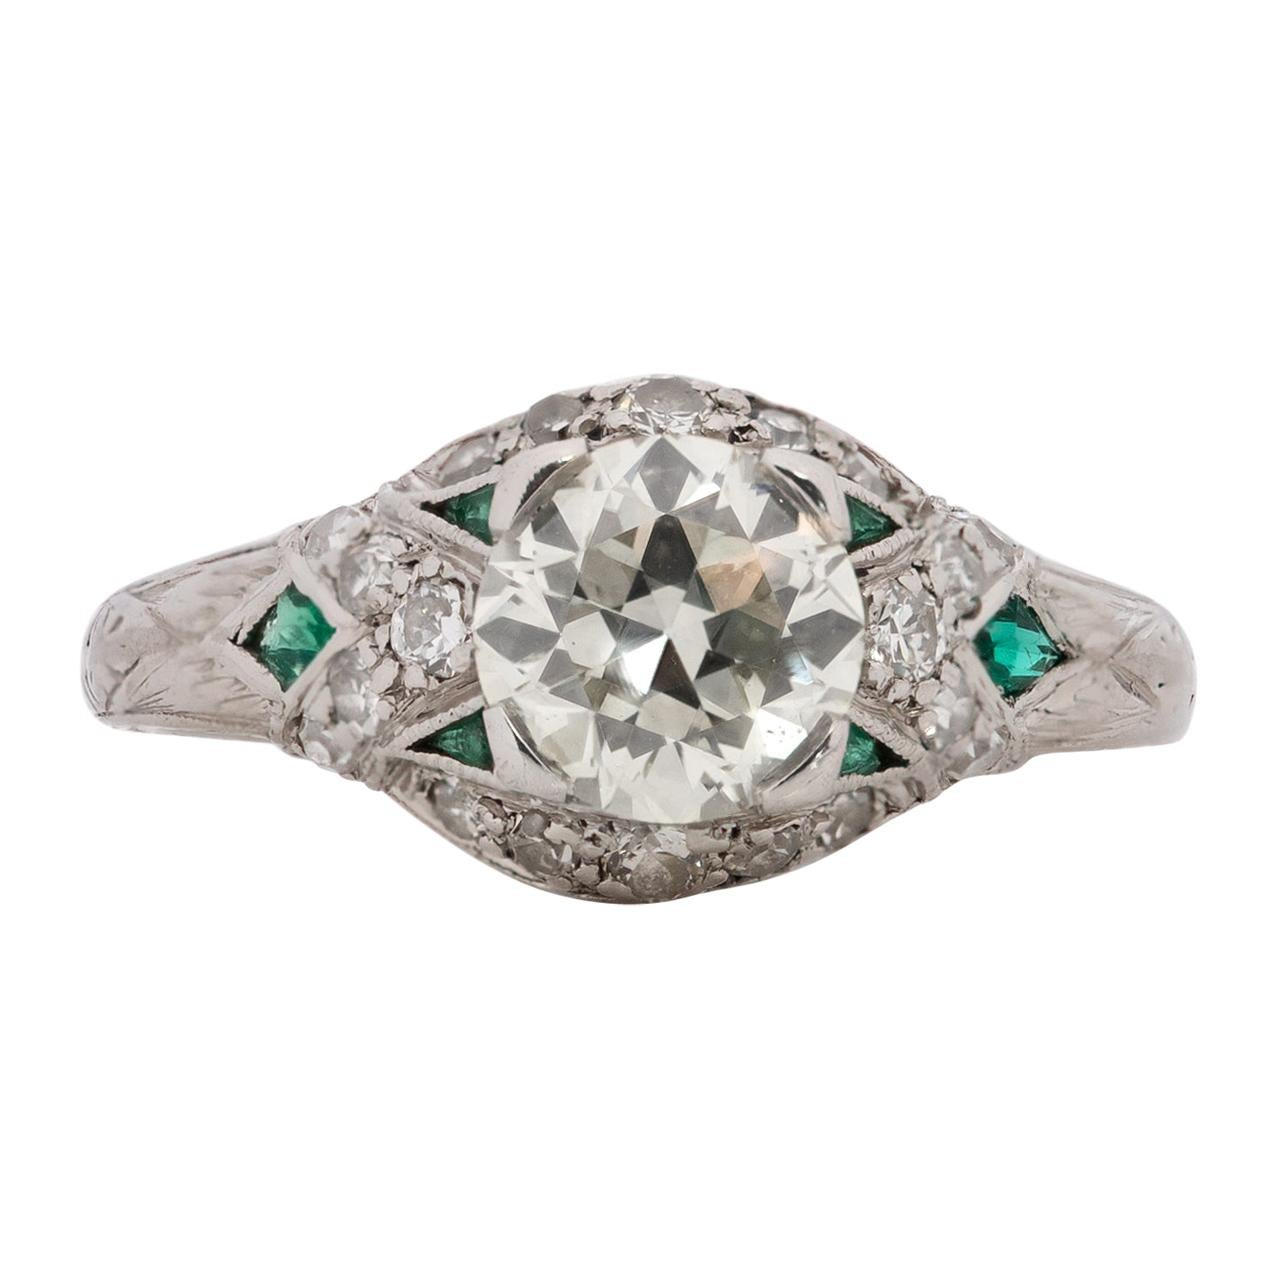 GIA Certified 1.20 Carat Art Deco Diamond Platinum Engagement Ring